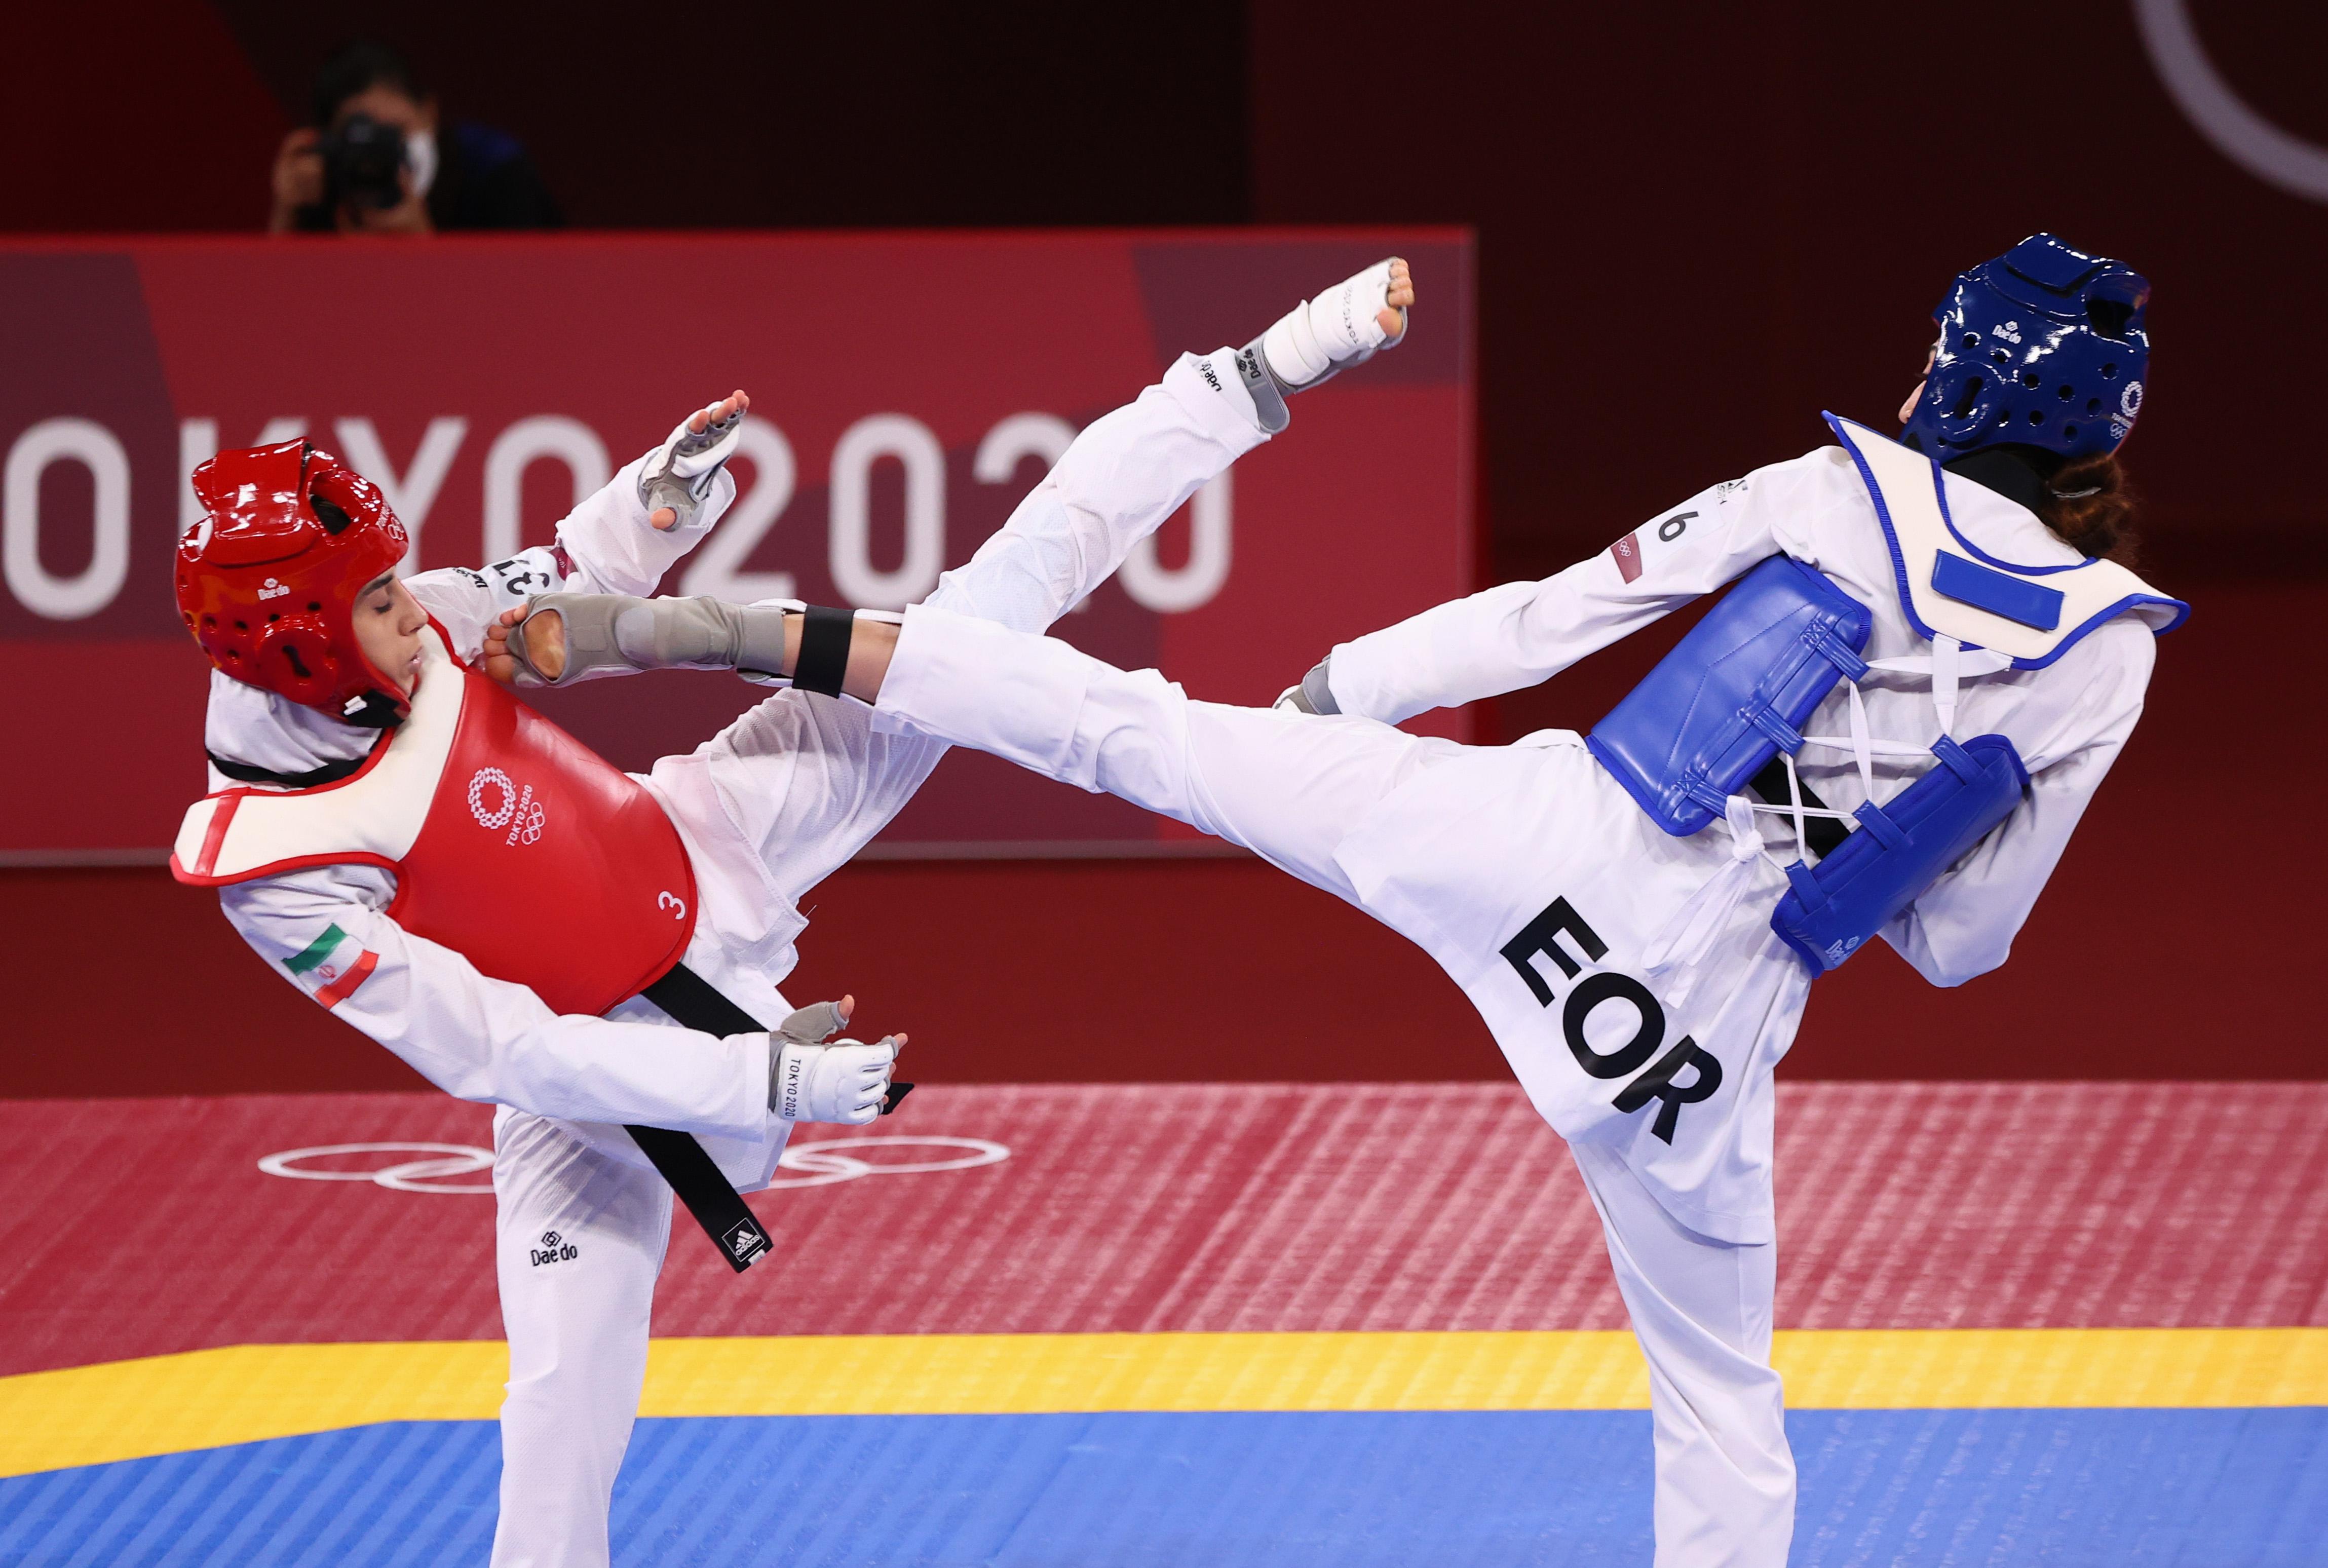 Tokyo 2020 Olympics - Taekwondo - Women's 57kg - Qualification Contest - Makuhari Messe Hall A, Chiba, Japan - July 25, 2021. Kimia Alizadeh of the Refugee Olympic Team in action against Nahid Kiyanichandeh of Iran REUTERS/Murad Sezer